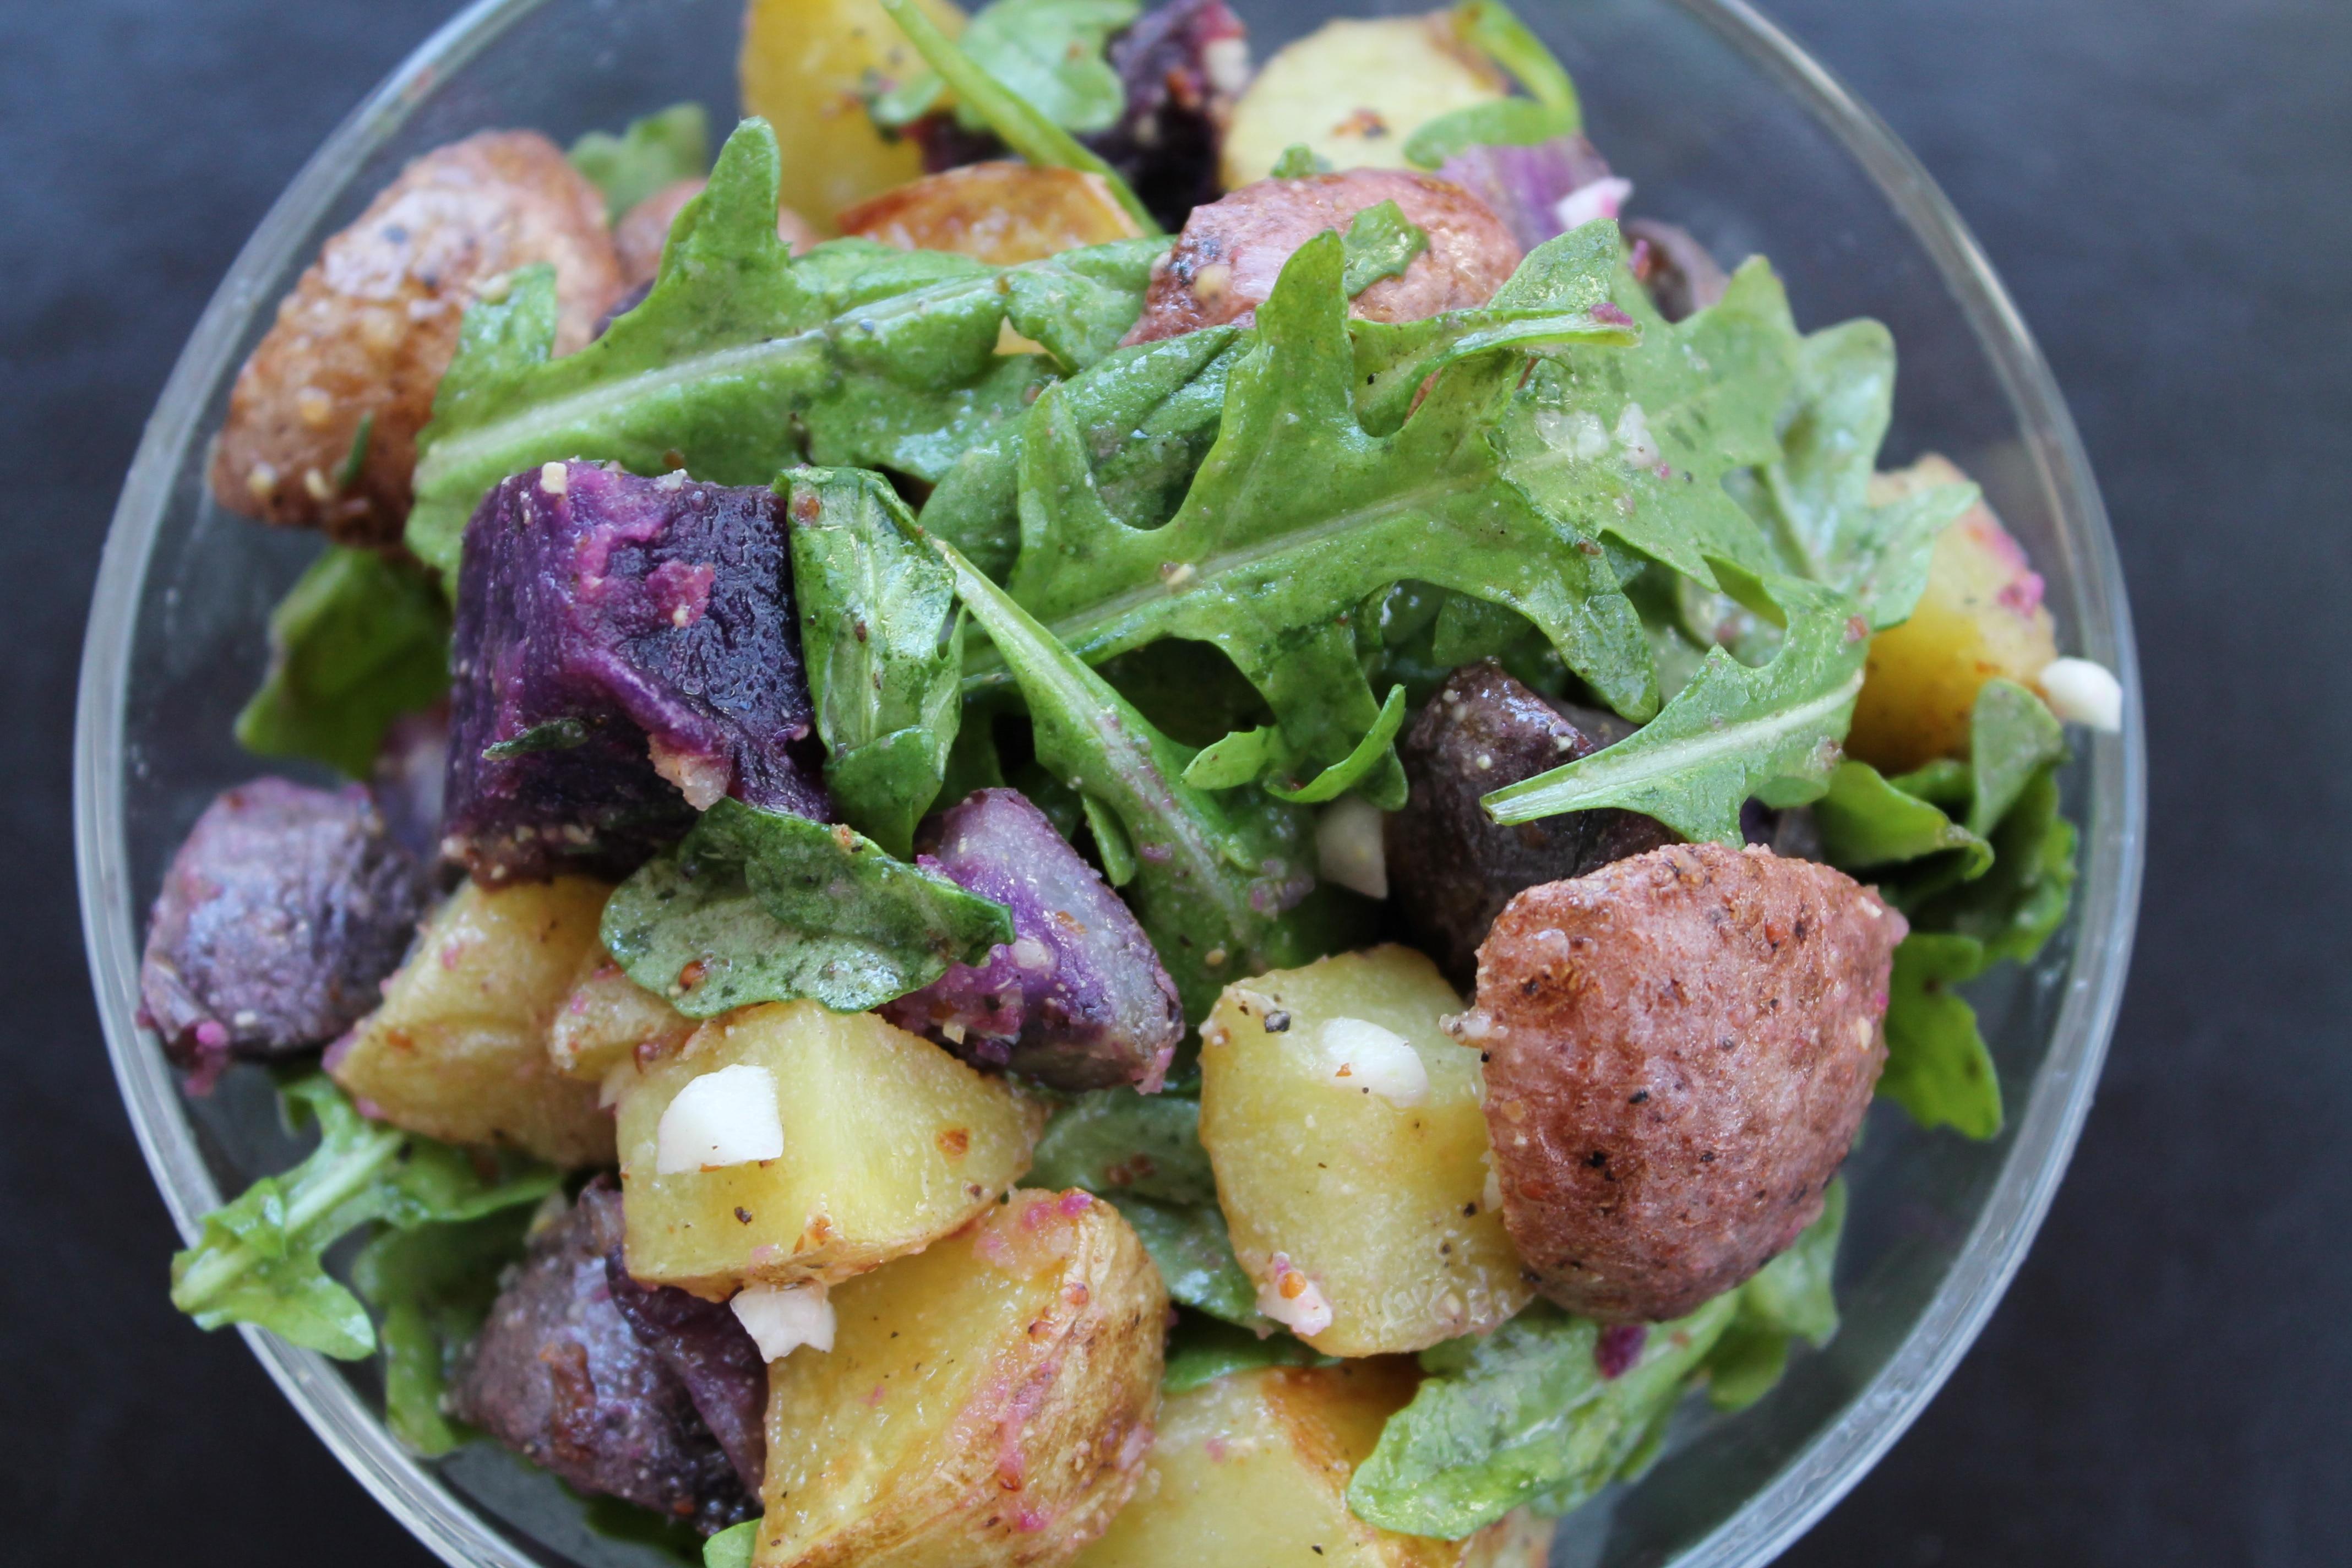 Roasted Potato Salad with Arugula and Garlic Lemon Vinaigrette